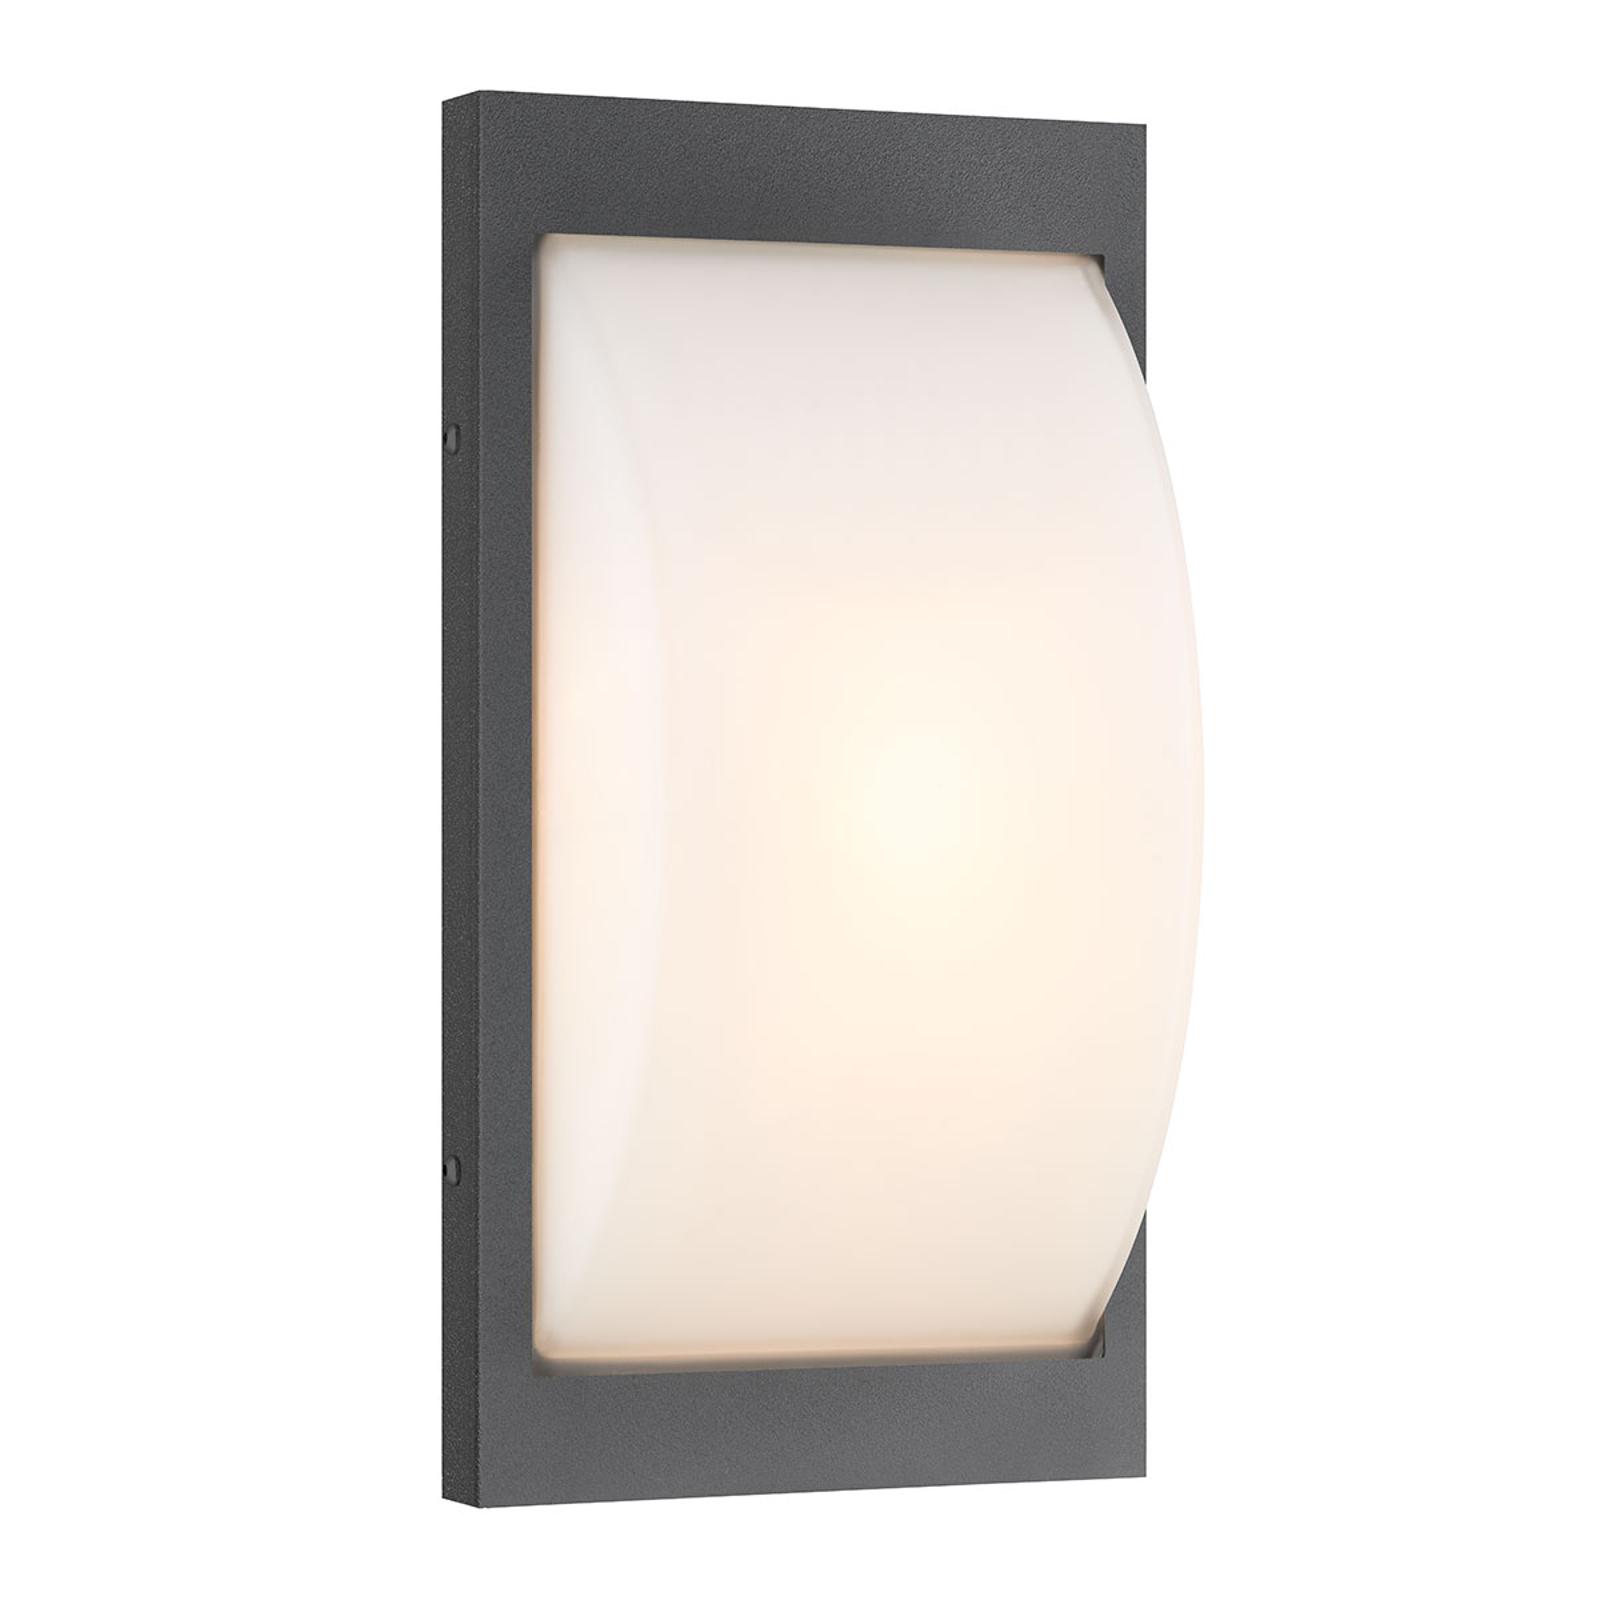 LED-ulkoseinälamppu 069LED, grafiitti